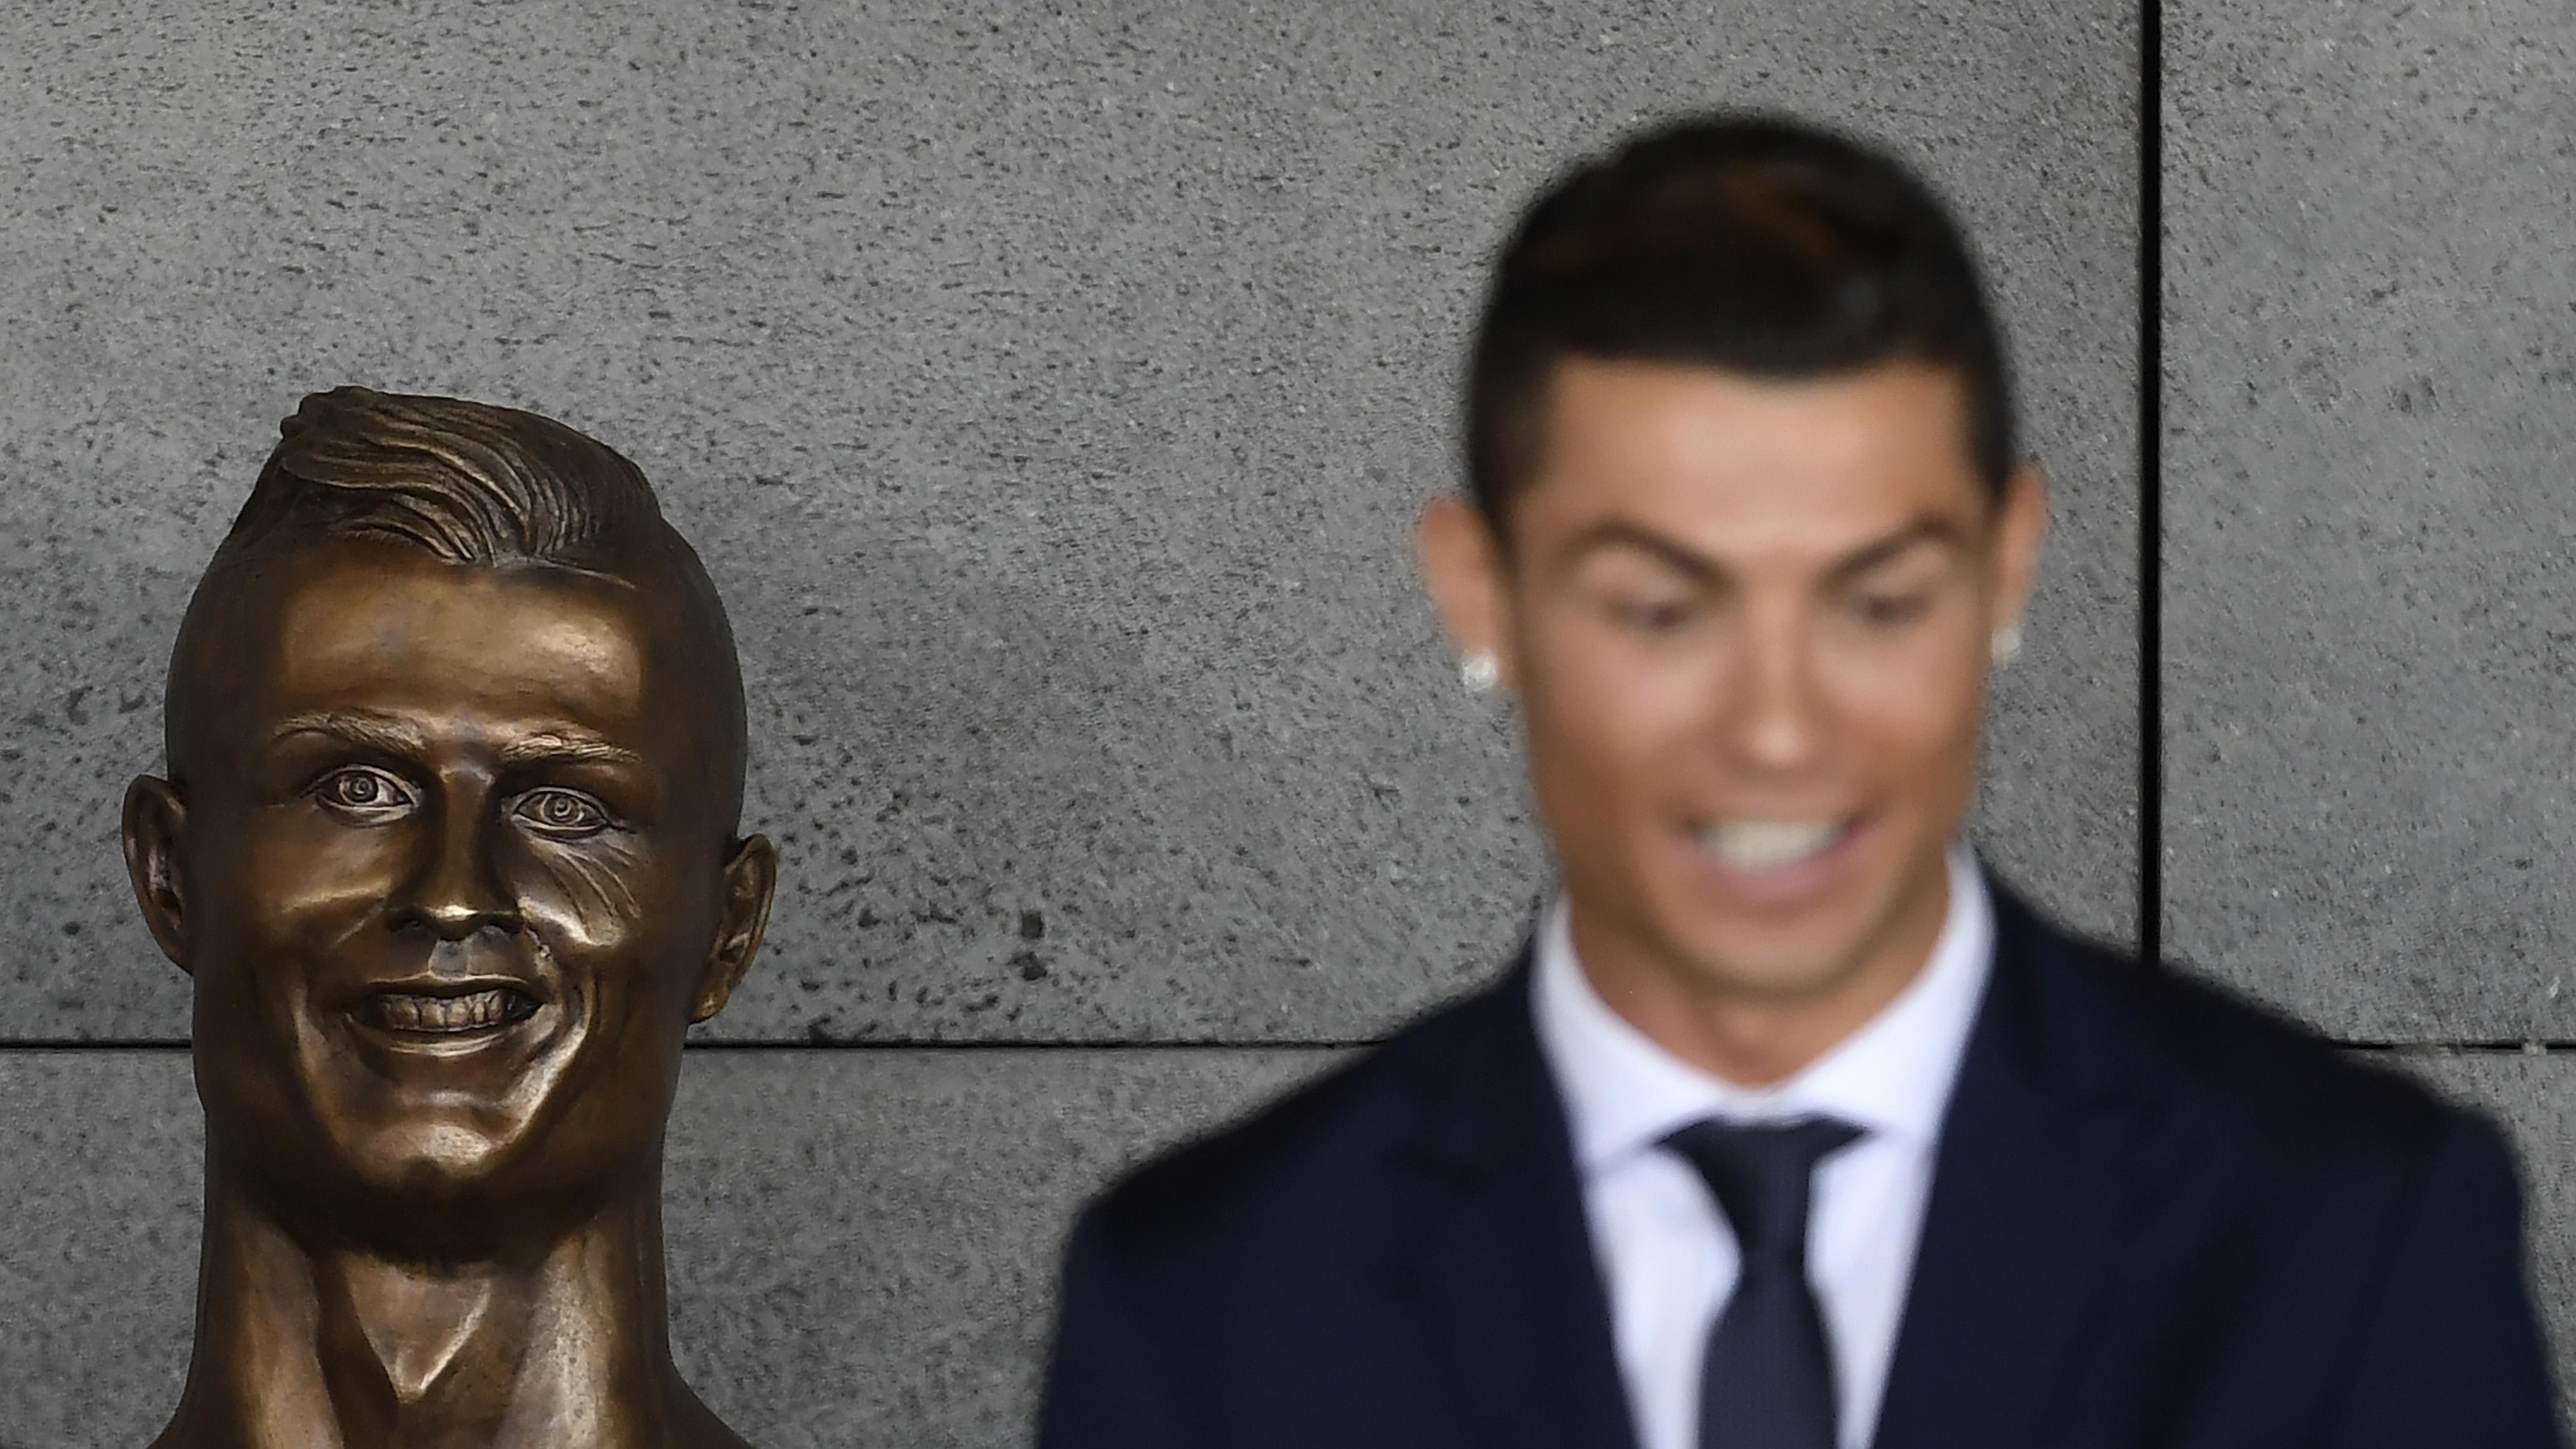 Cristiano Ronaldo statue: Sculptor explains his mistake